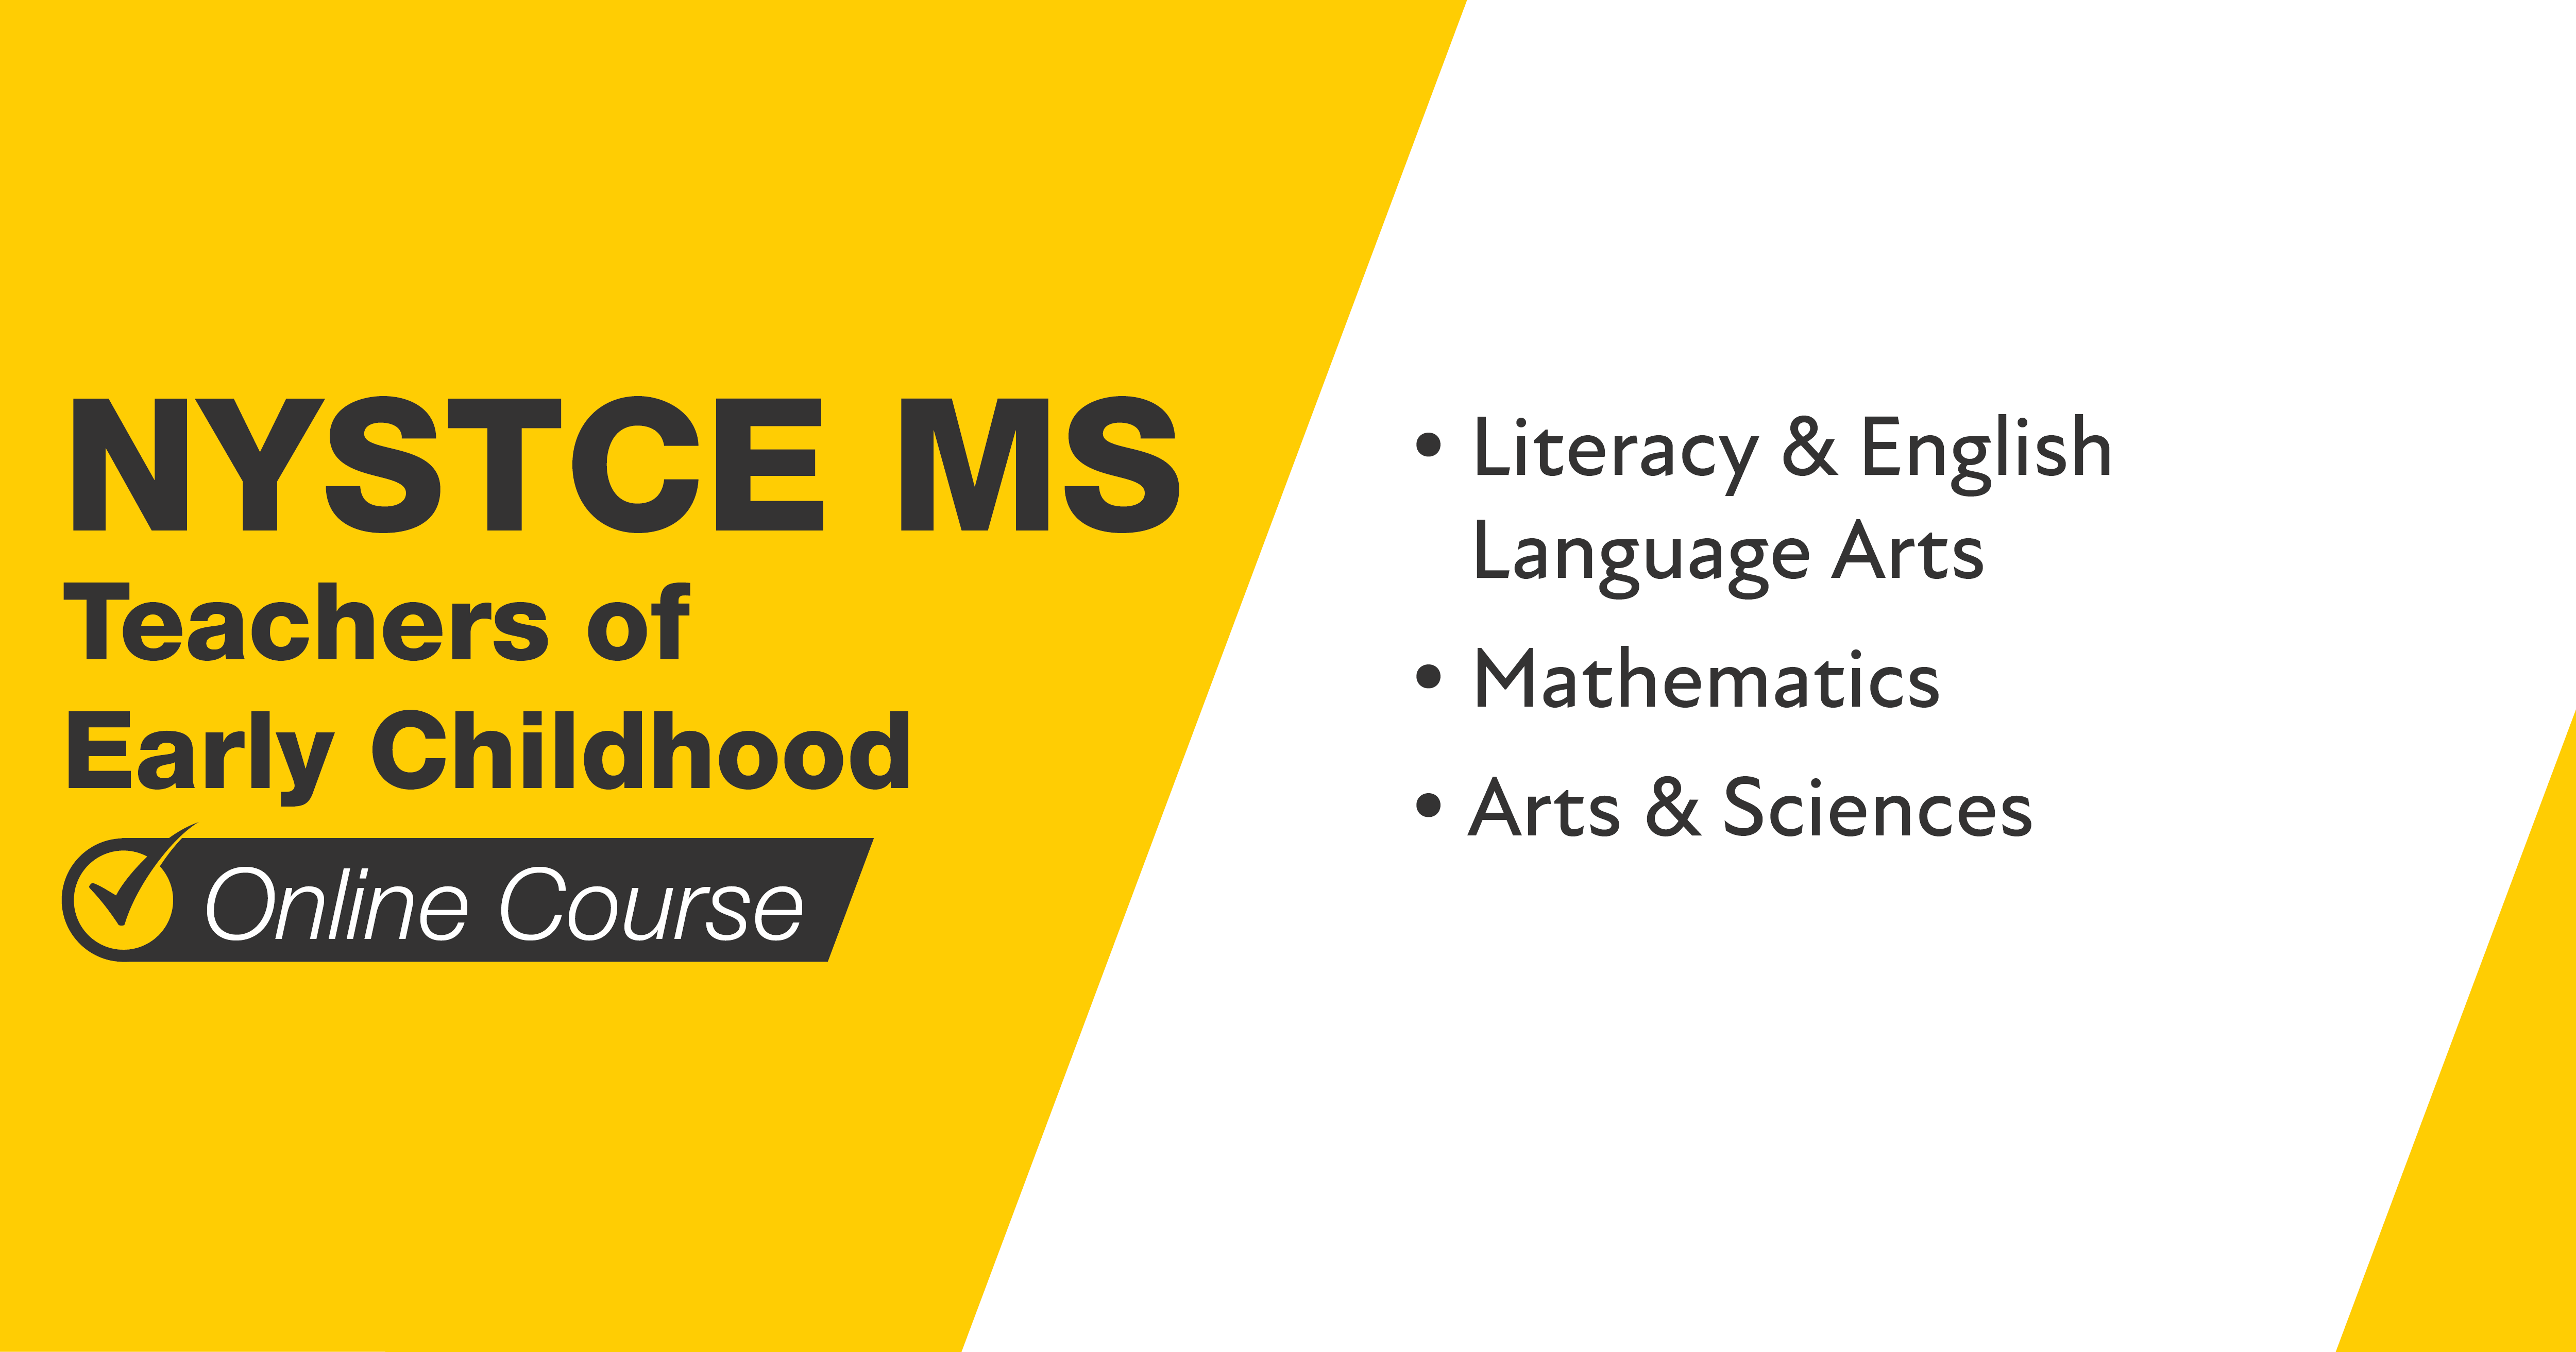 Mometrix NYSTCE MS Teachers of Early Childhood Course